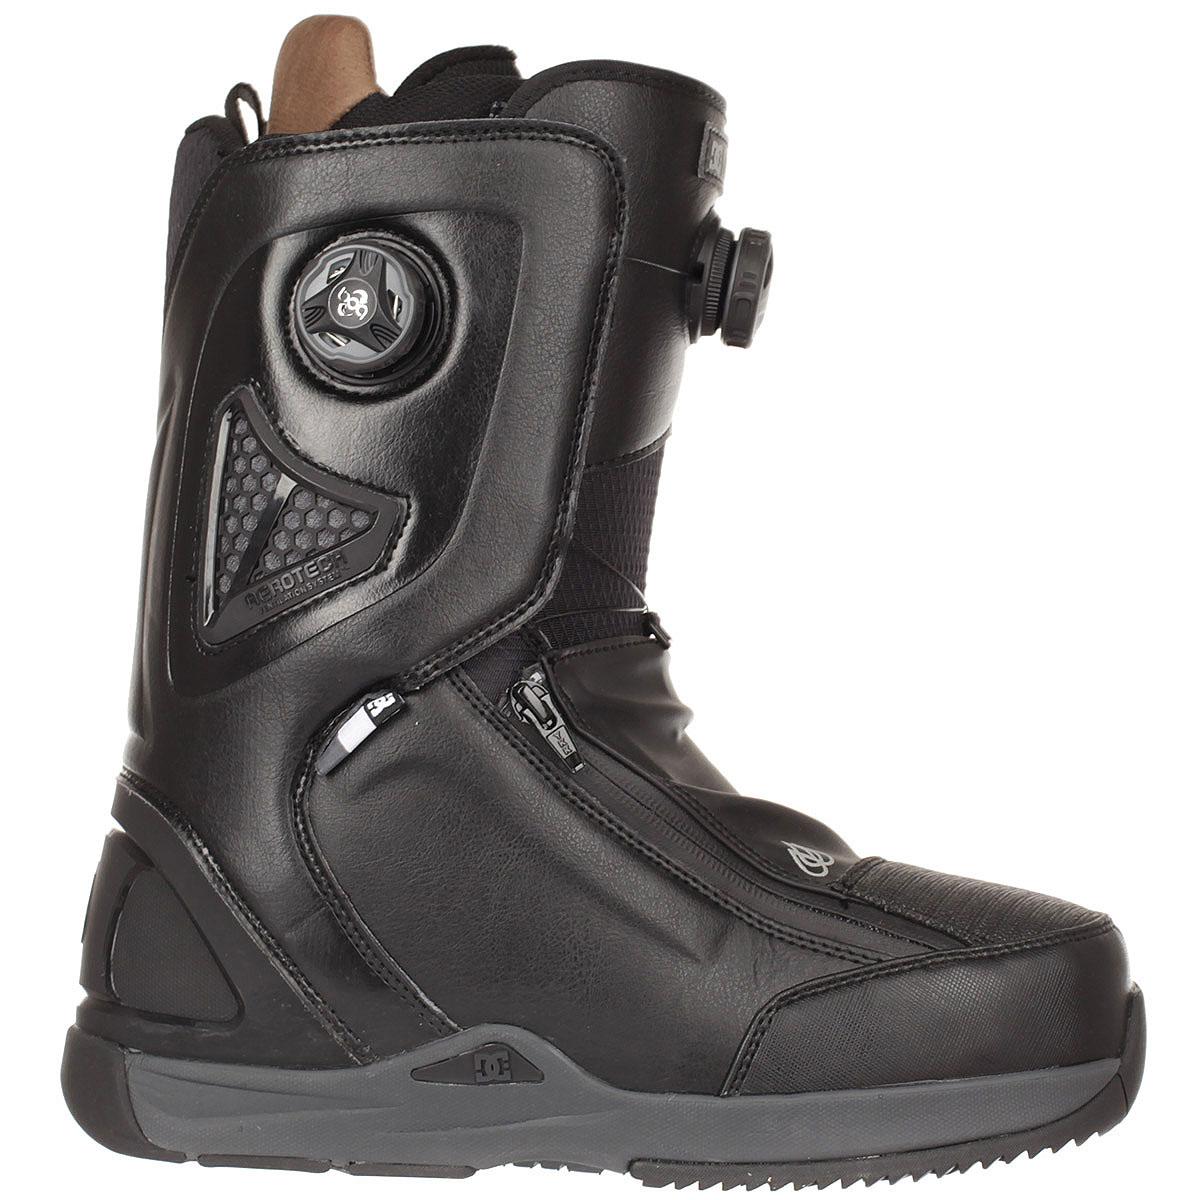 Купить ботинки для сноуборда DC Shoes Travis Rice Black Red ... 301e6daa4b1